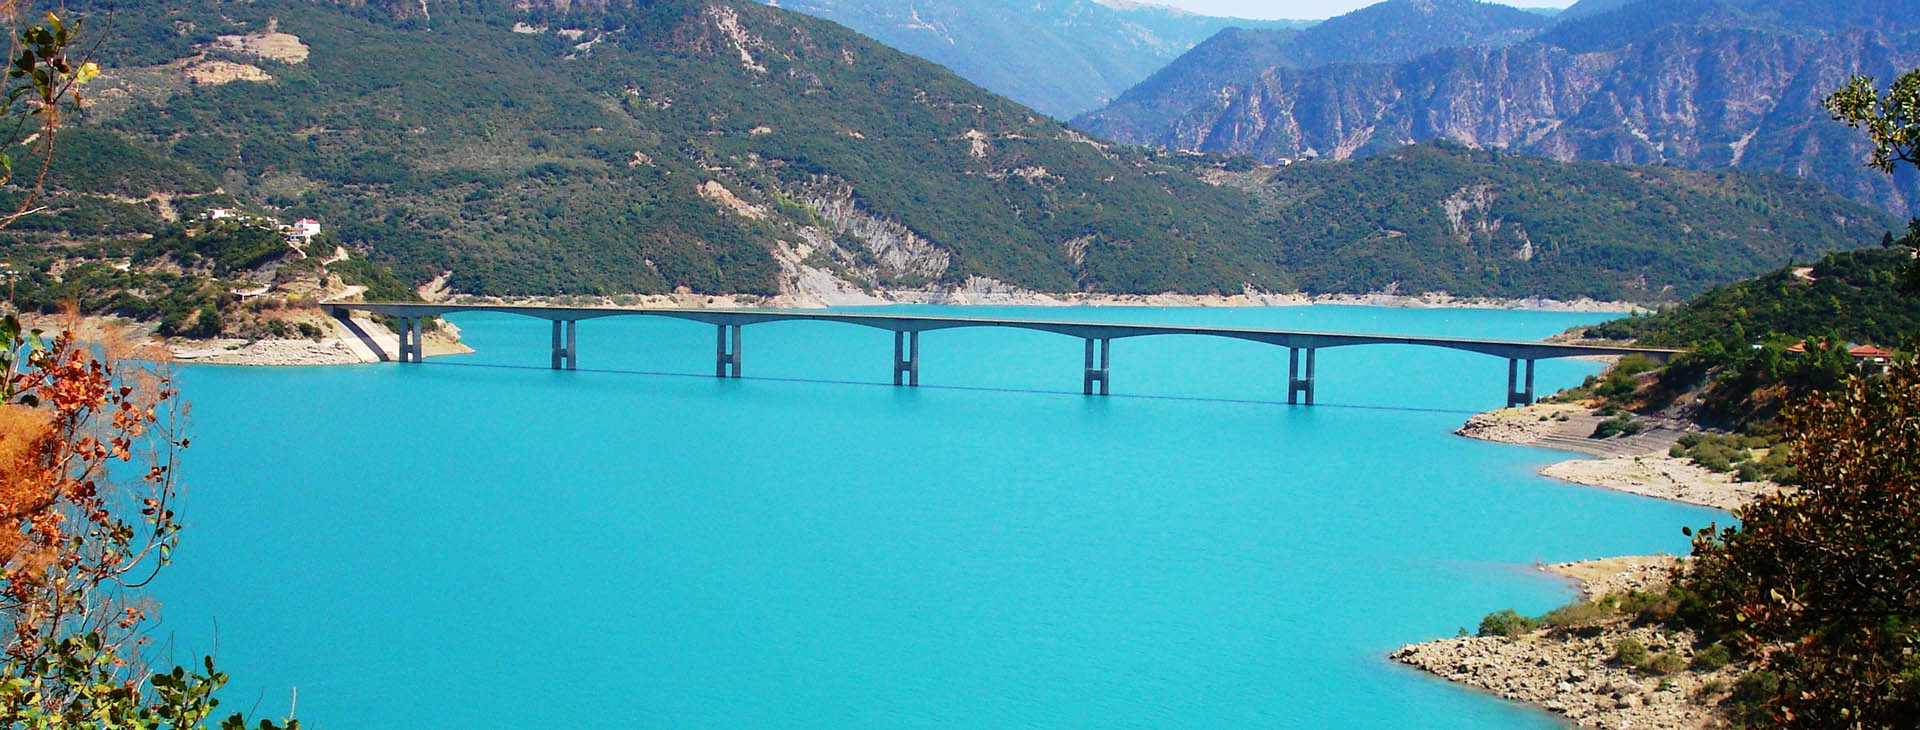 Episkopi Bridge - Kremasta lake, Aitoloakarnania